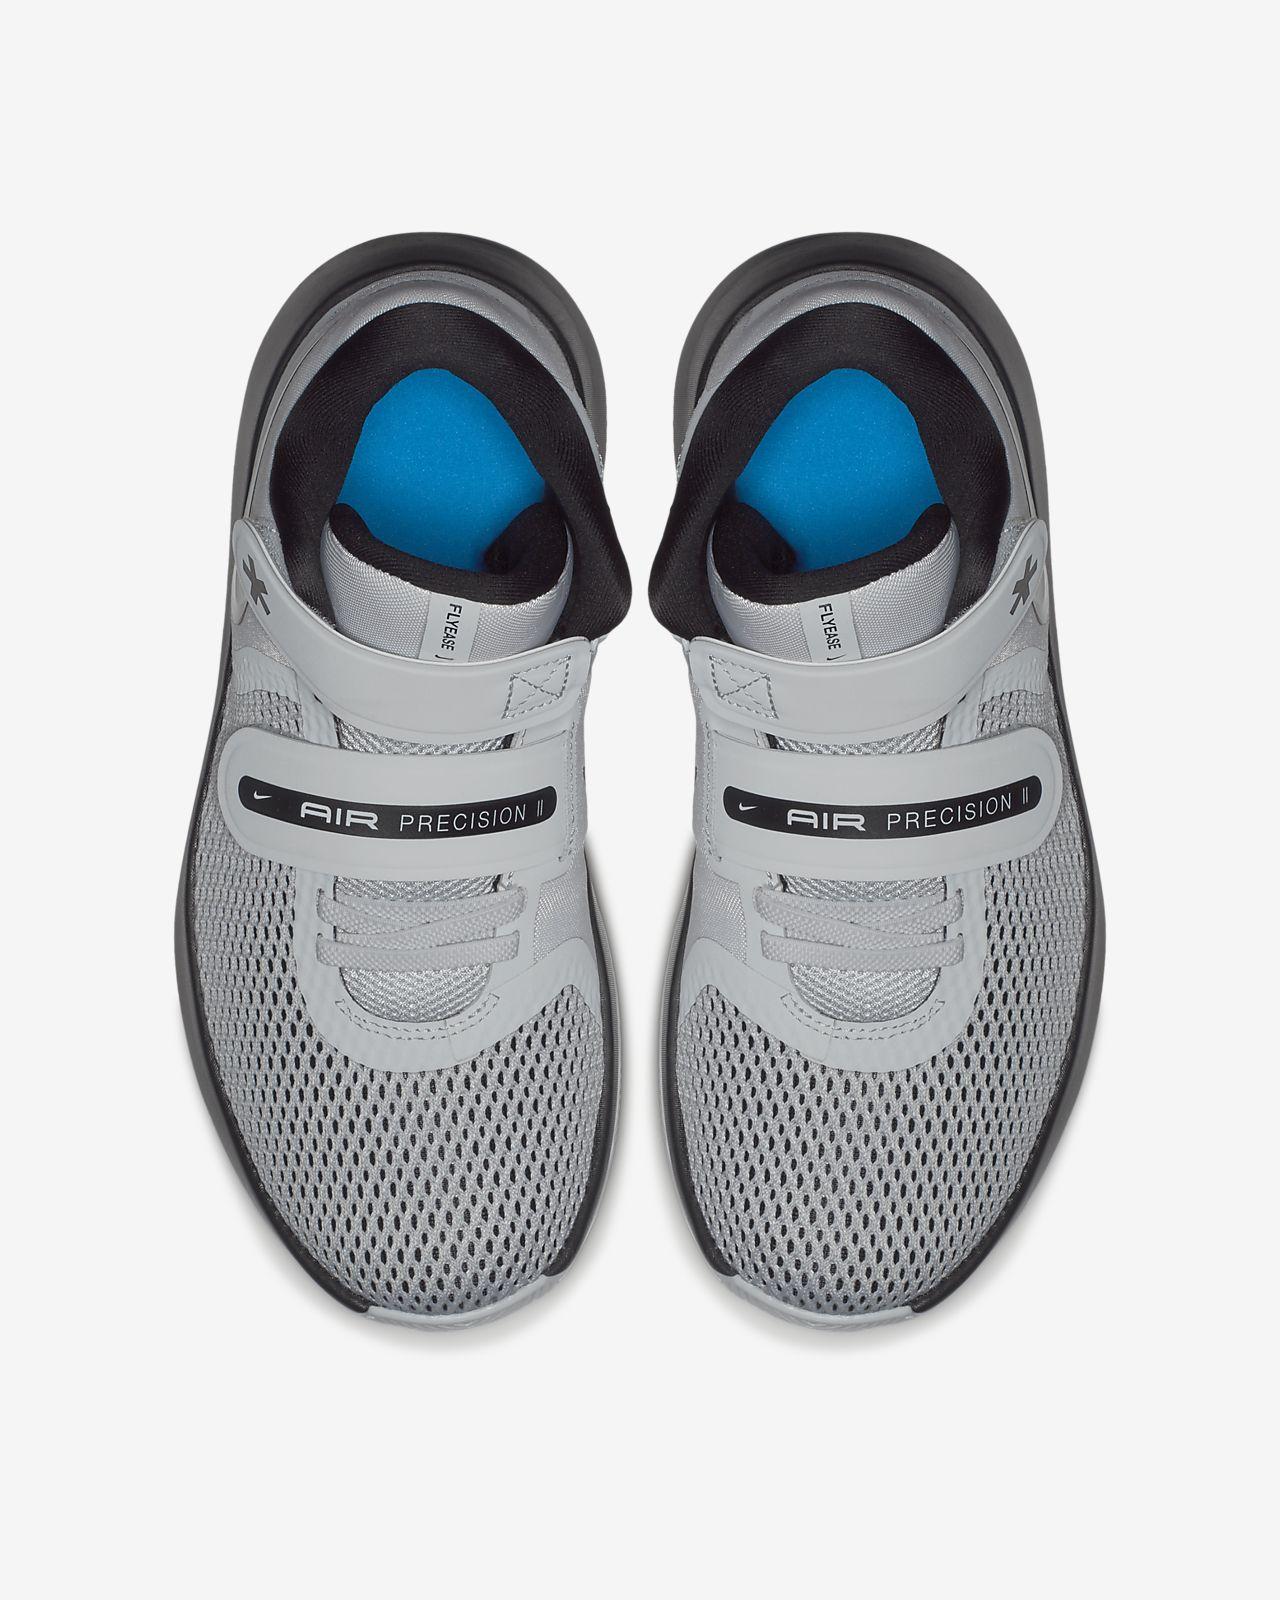 promo code 0054f 2ab2e ... Nike Air Precision II FlyEase (Extra-Wide) Women's Basketball Shoe